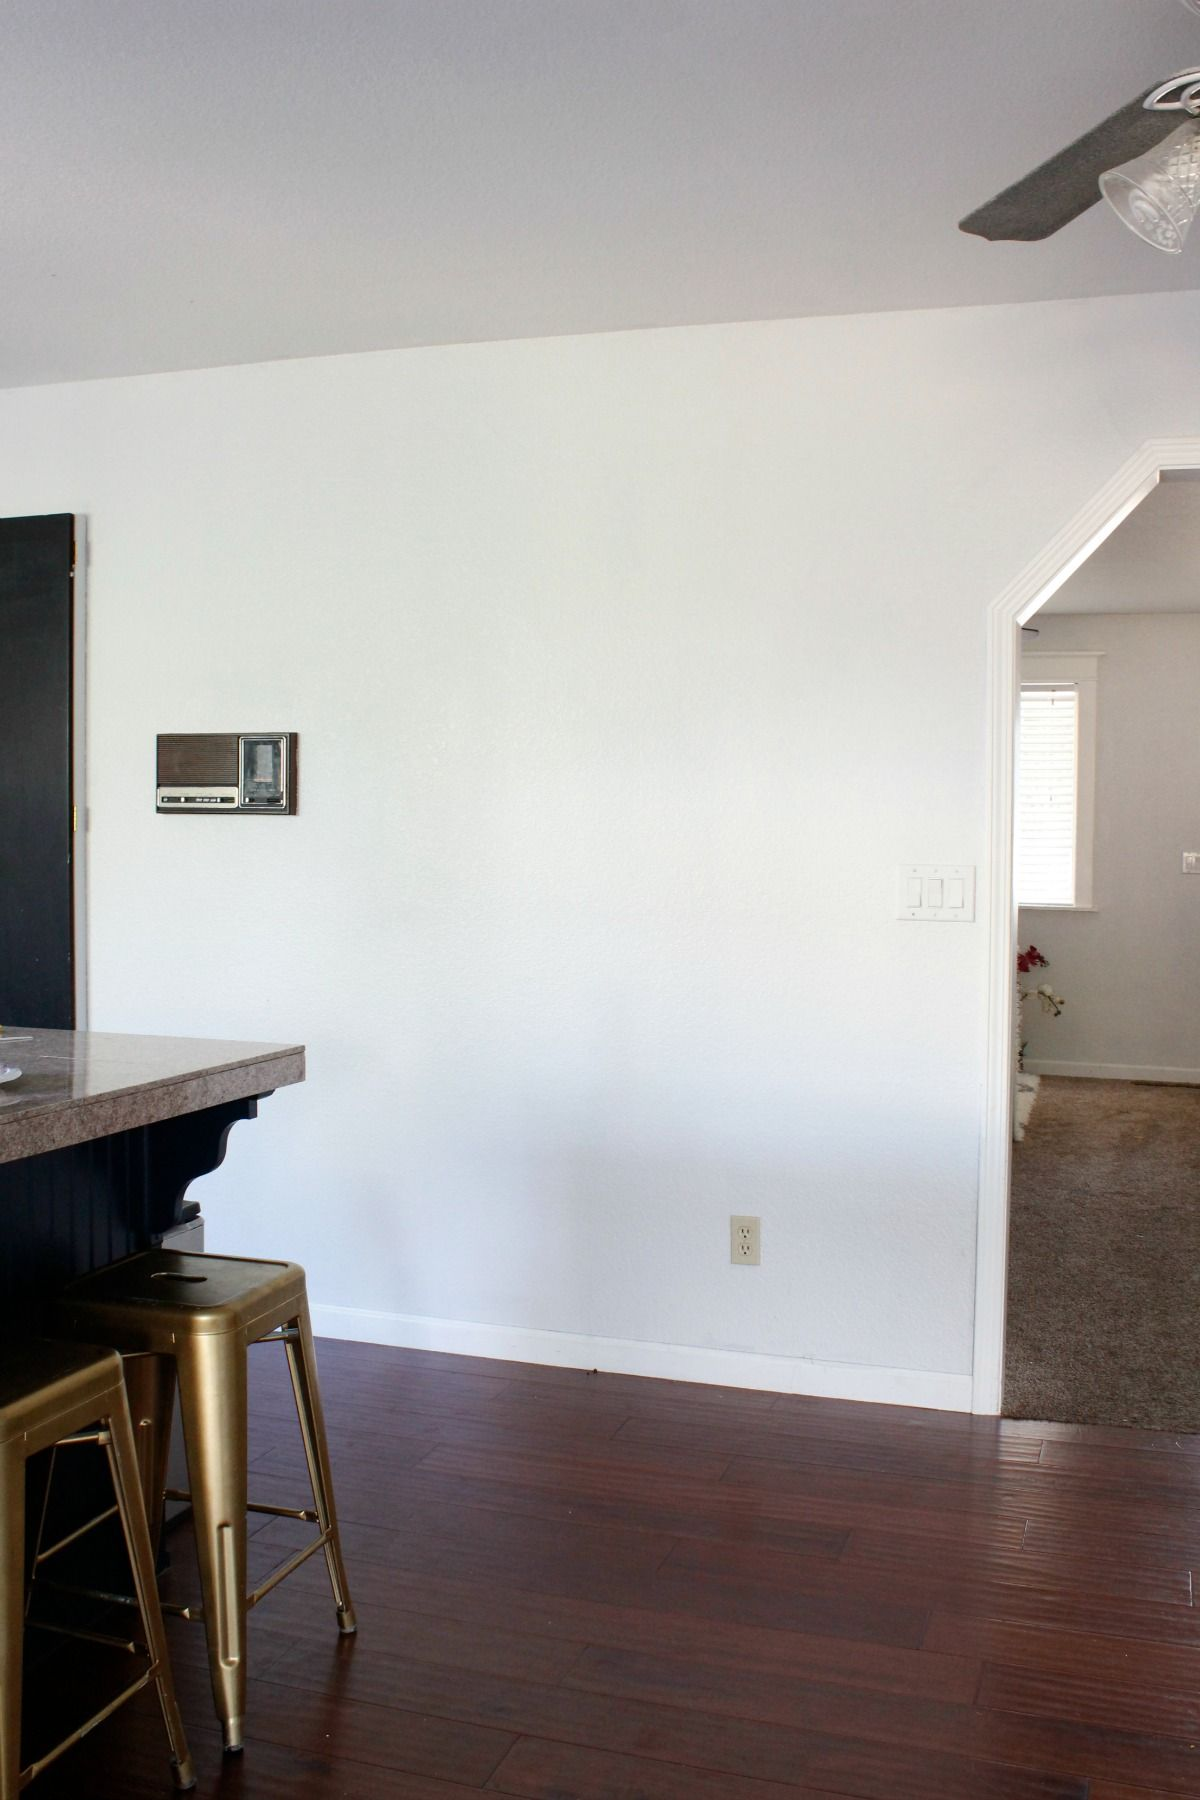 Cafe Kitchen Decor Sets | Cafe kitchen decor, Kitchen decor and ...